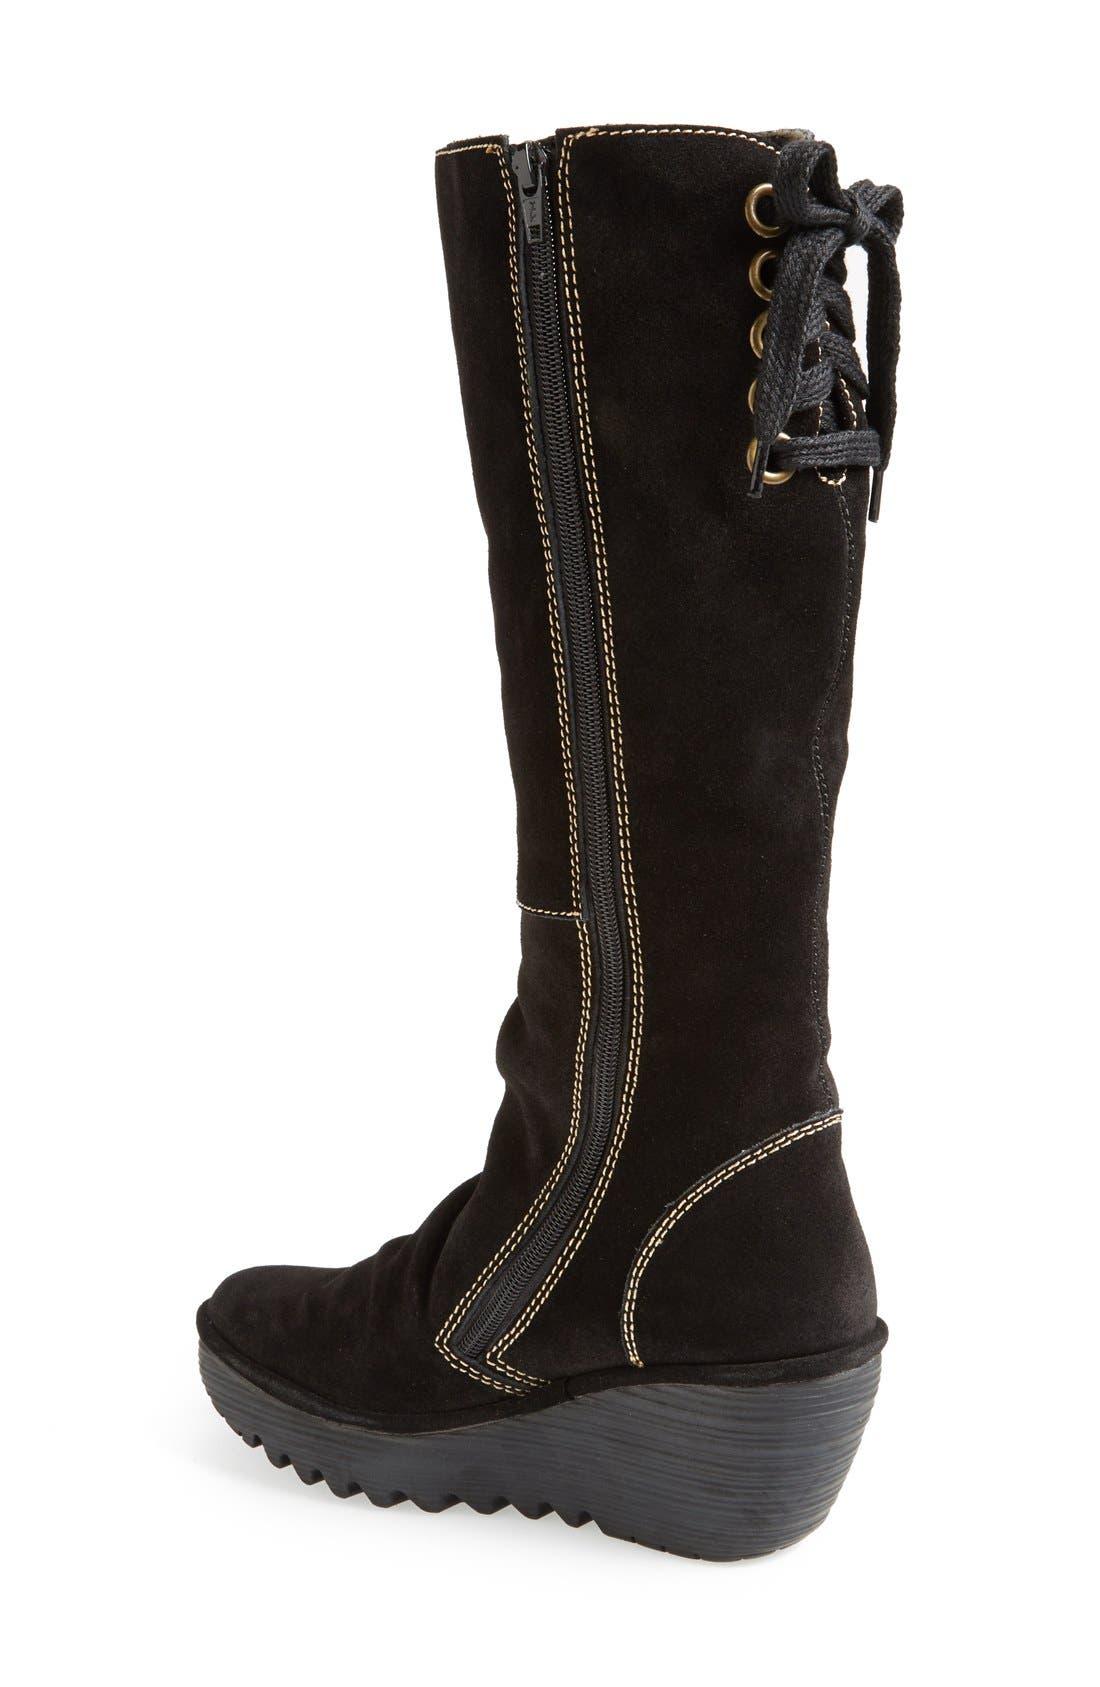 'Yust' Knee High Platform Wedge Boot,                             Alternate thumbnail 2, color,                             Black Suede